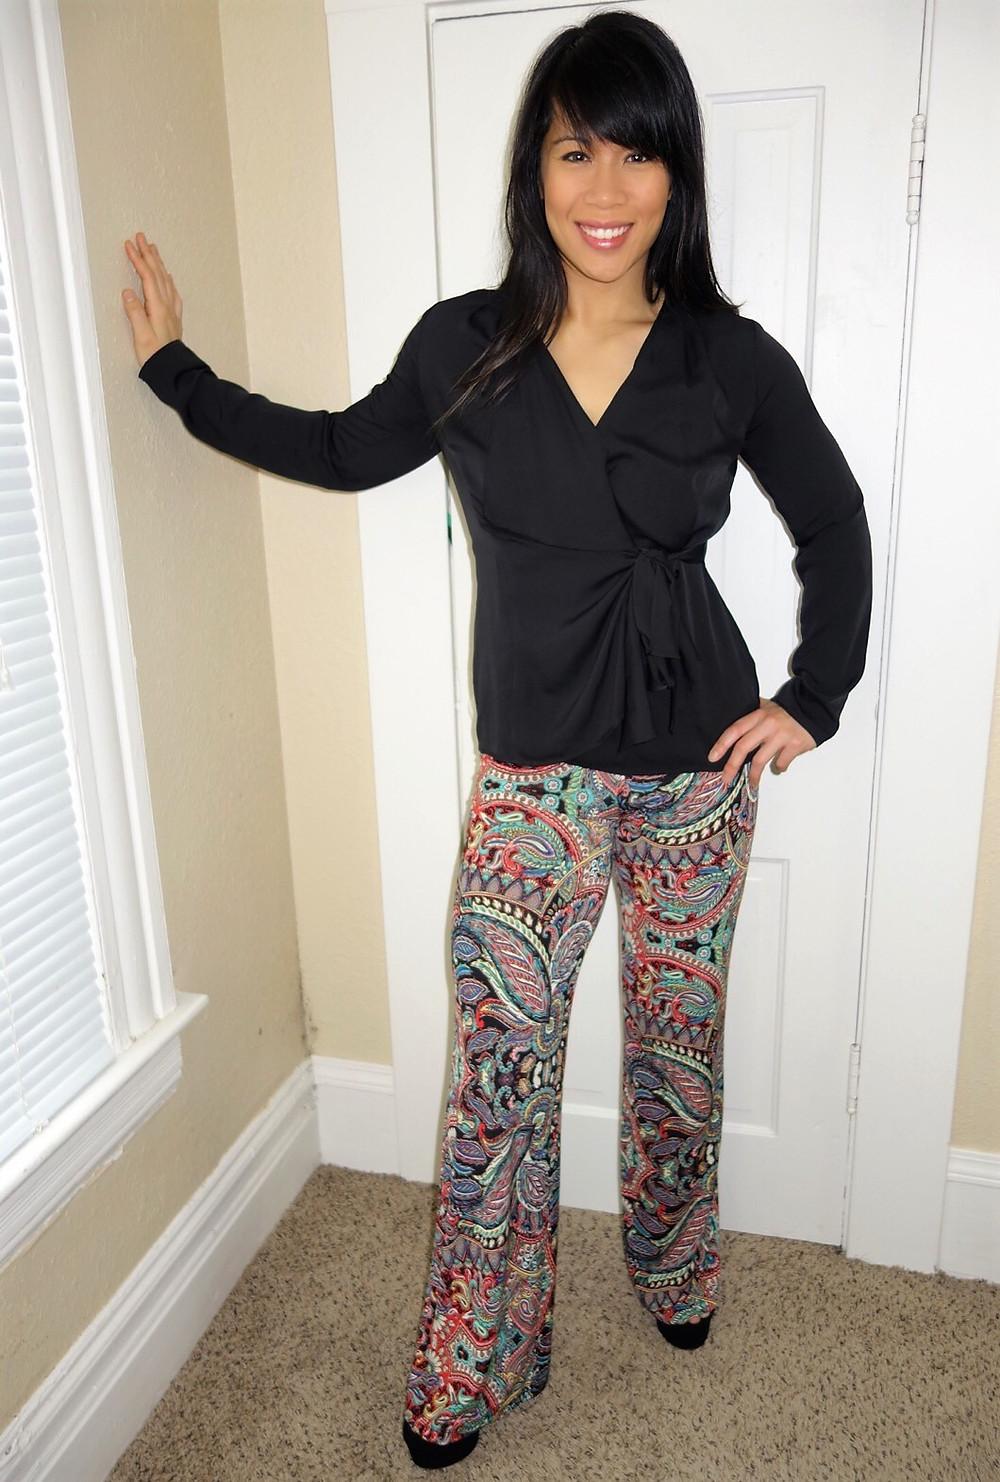 Kat Depner wearing bohemian patterned pants with black wrap top